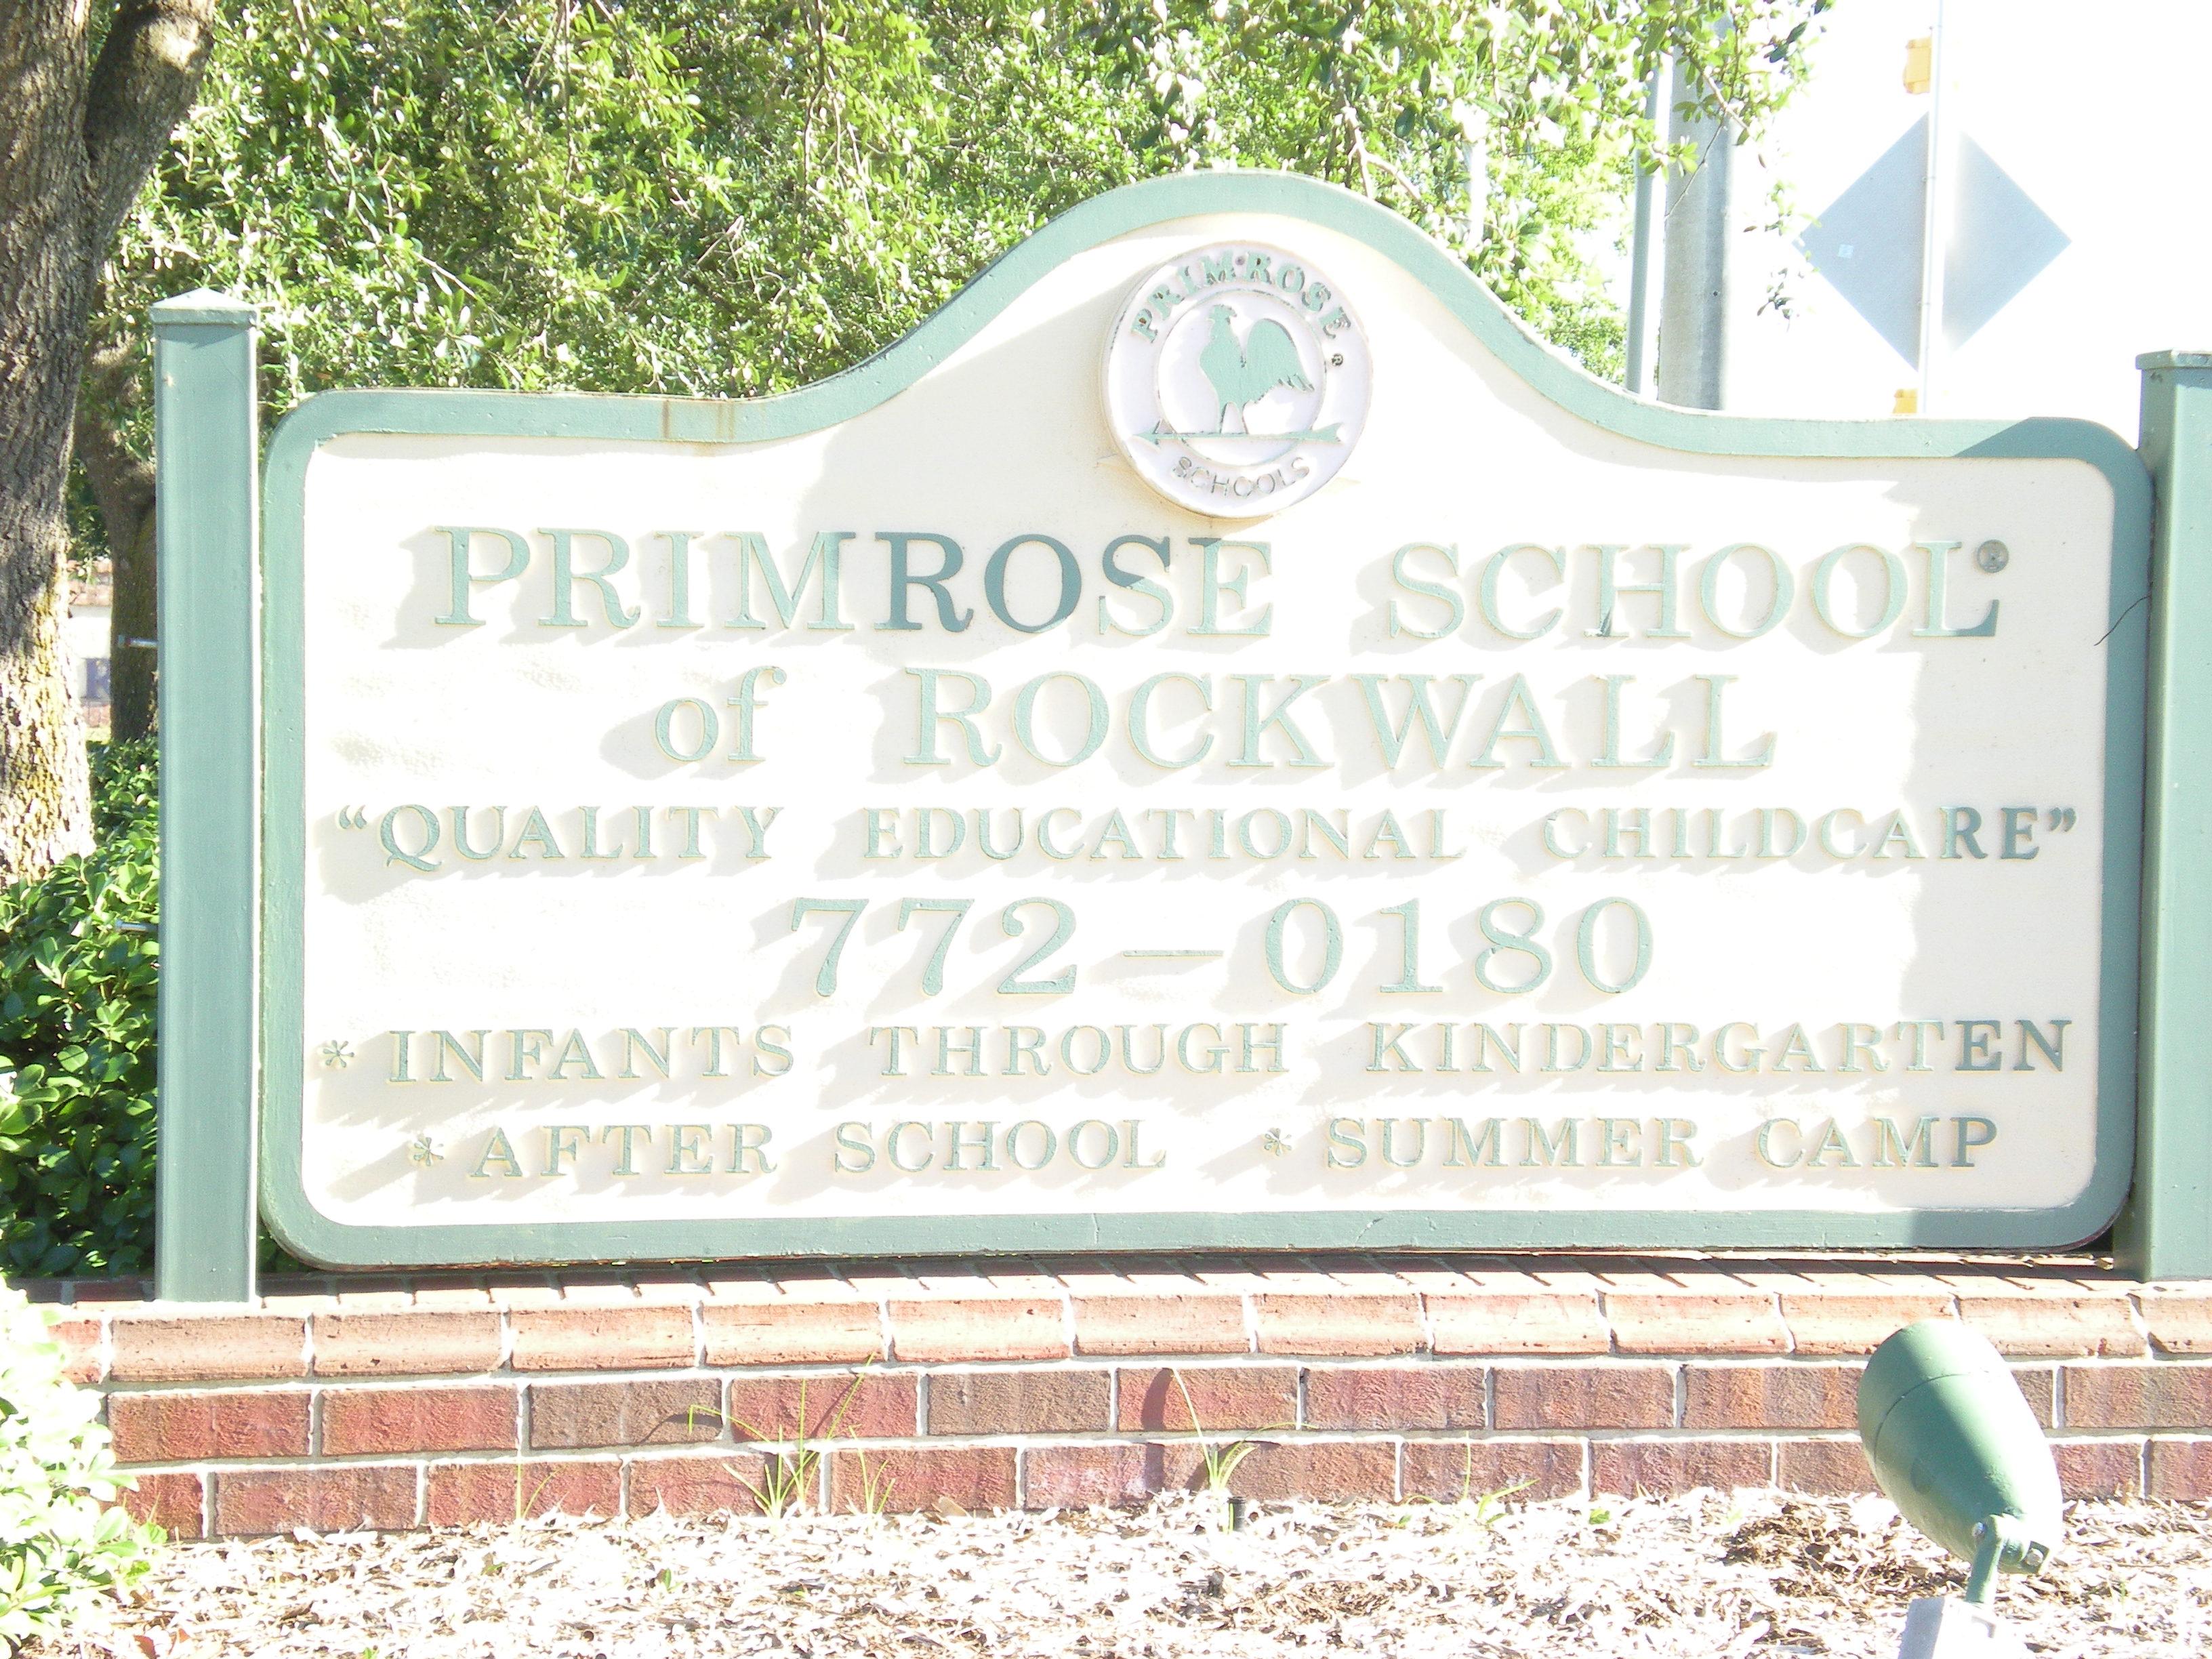 Primrose School of Rockwall image 3